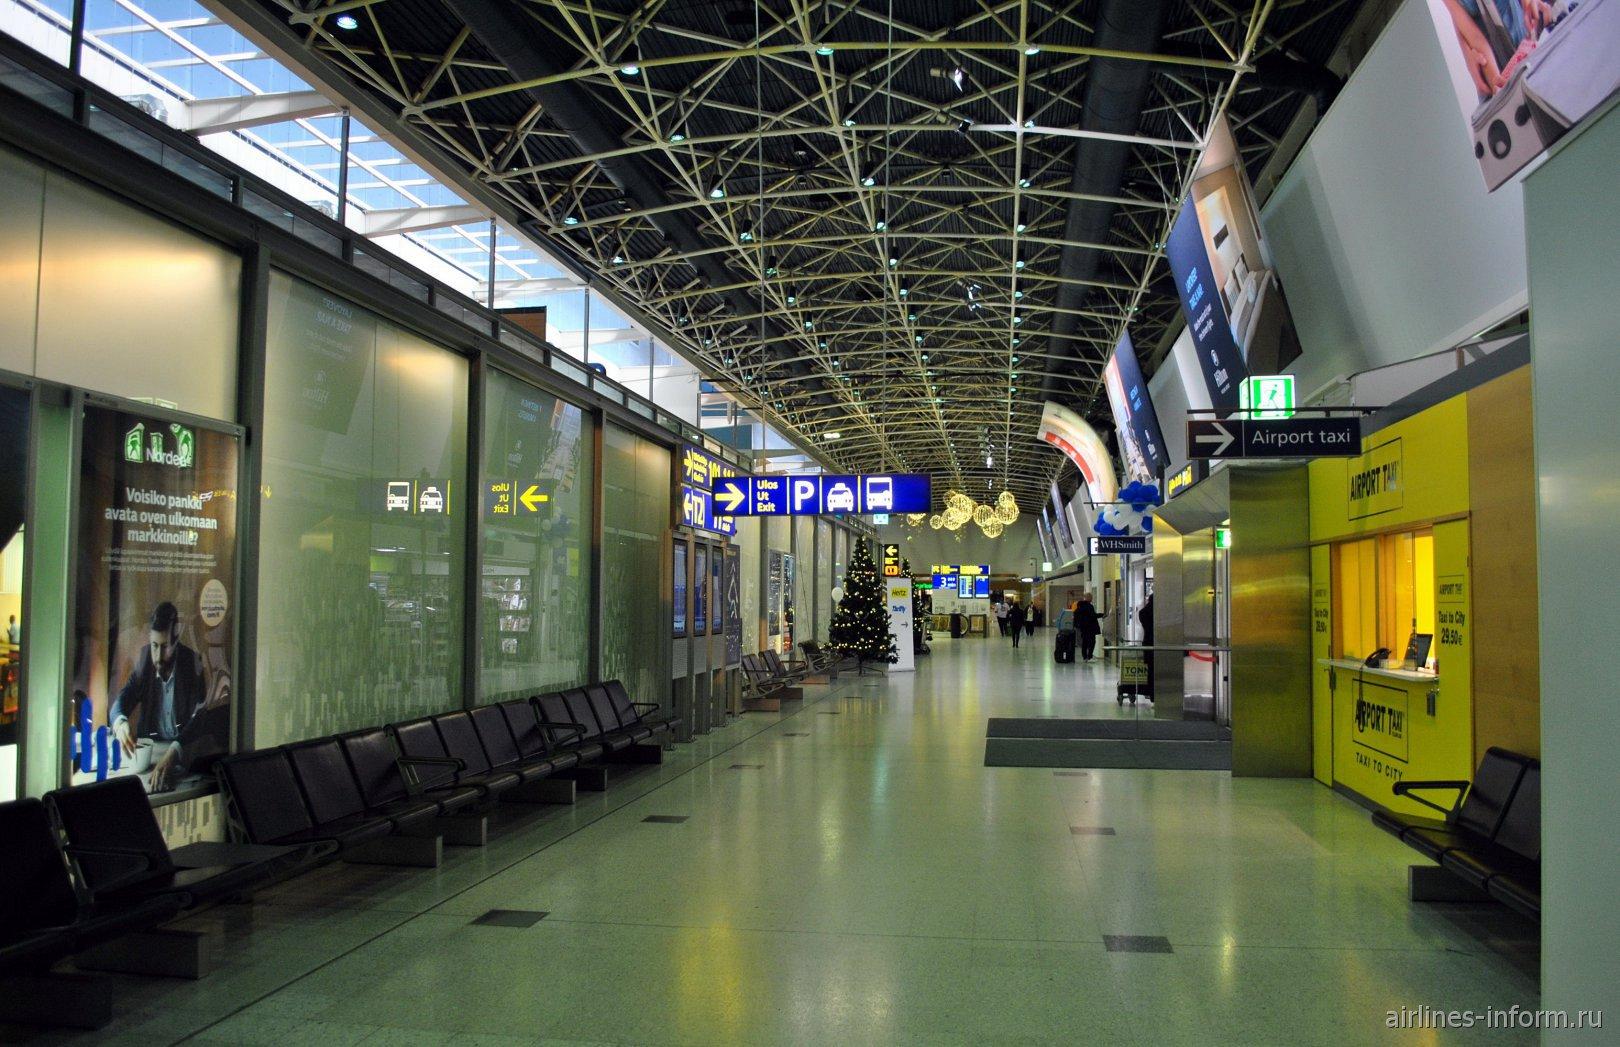 В терминале Т1 аэропорта Хельсинки Вантаа